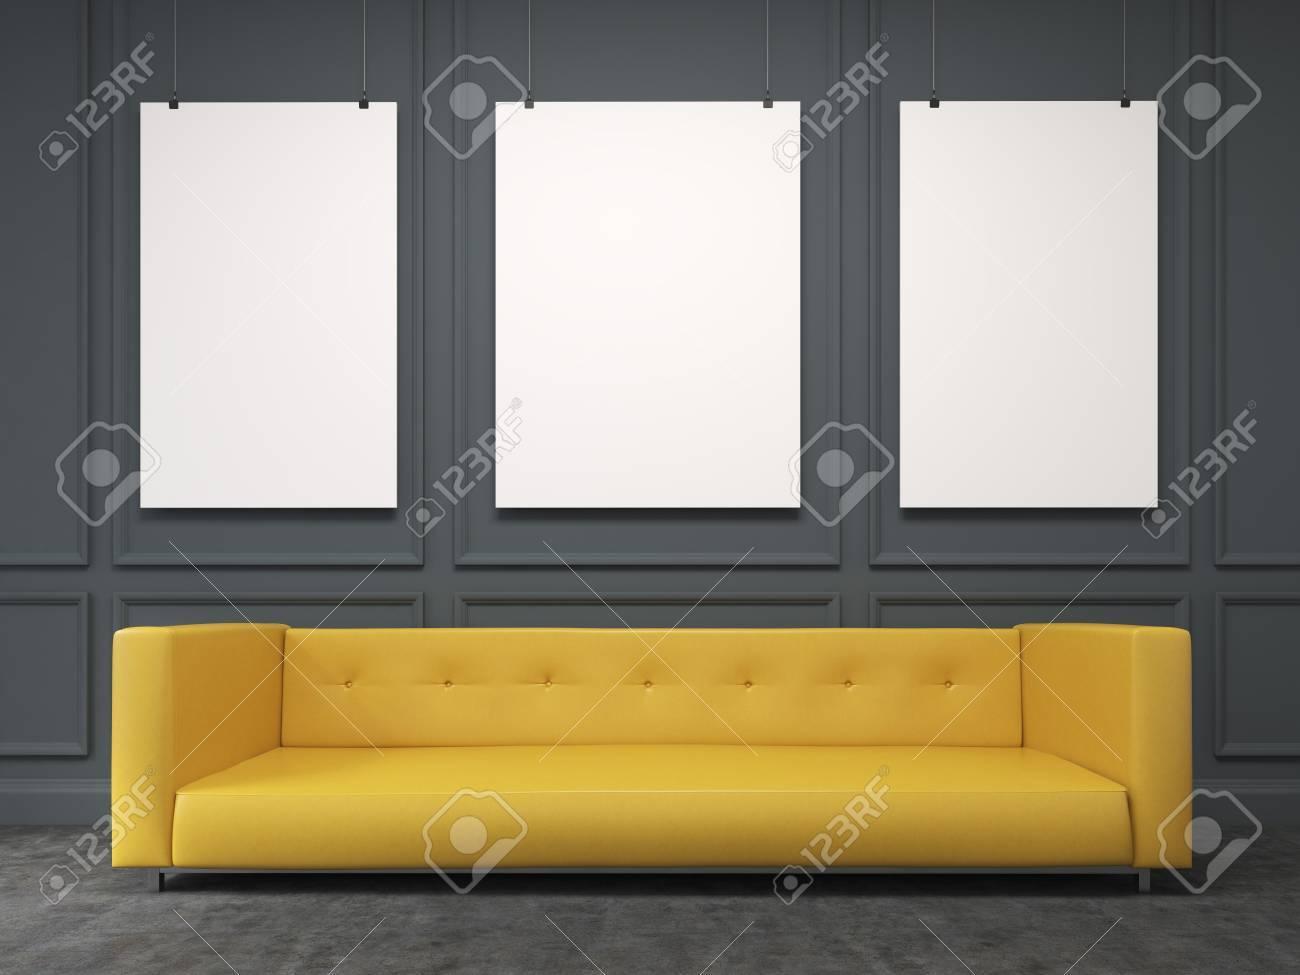 A Long Yellow Sofa Standing At The Black Wall, Three Blank Frames ...